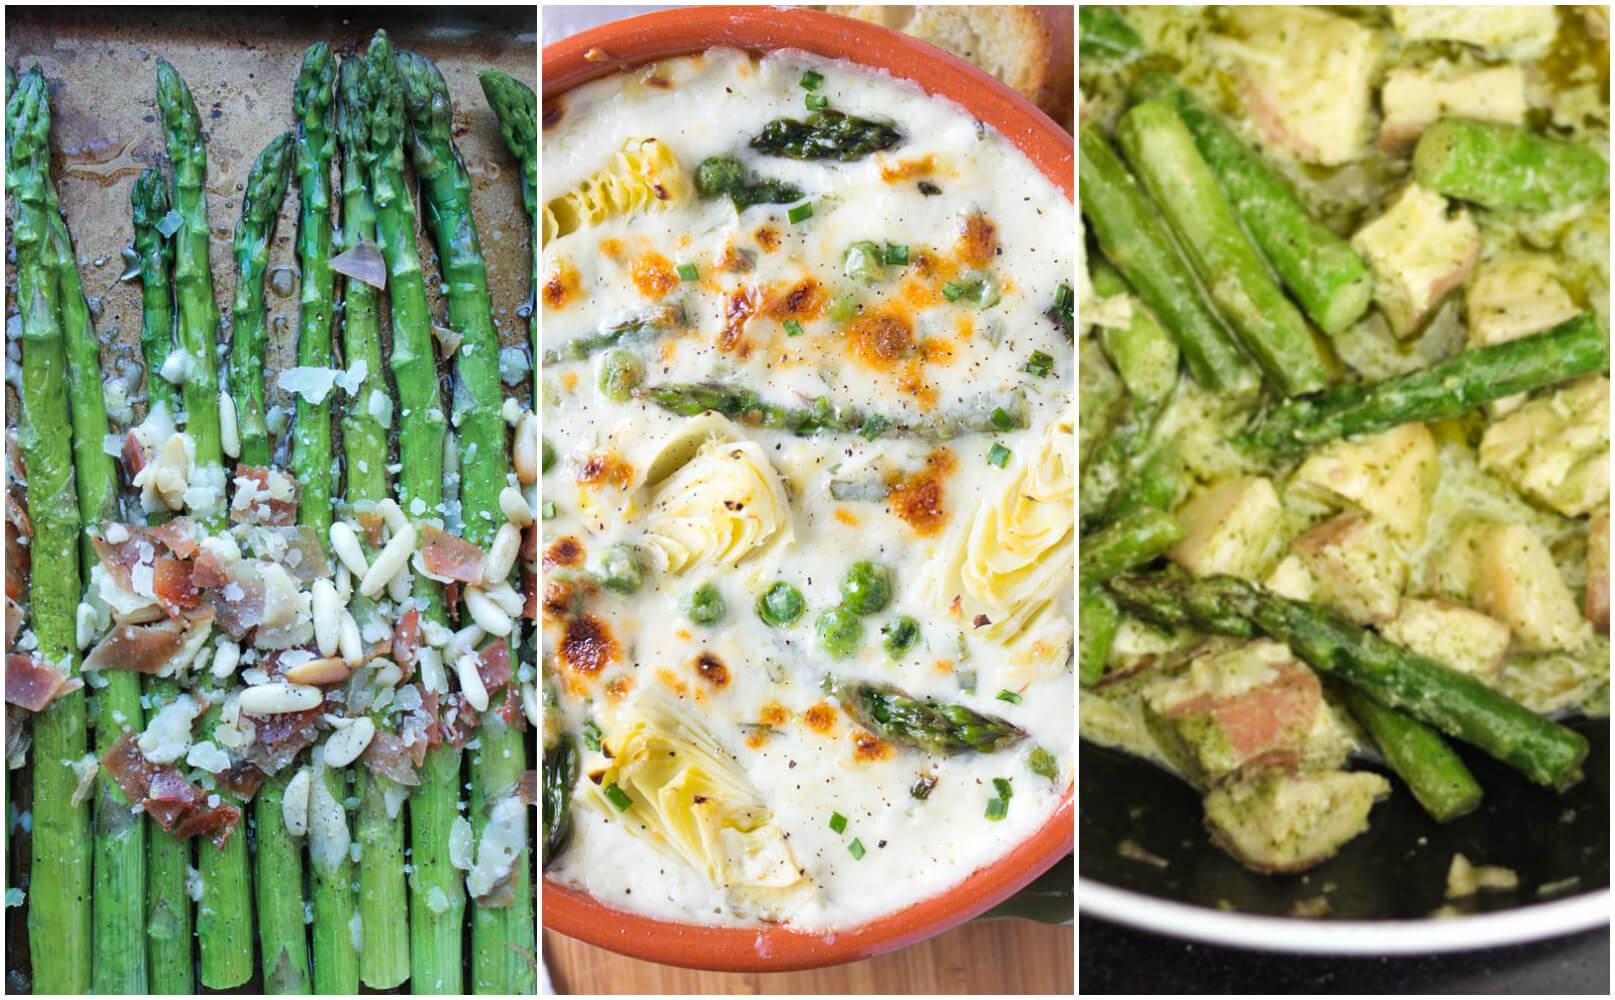 Best asparagus recipes + guide to spring produce | littlebroken.com @littlebroken